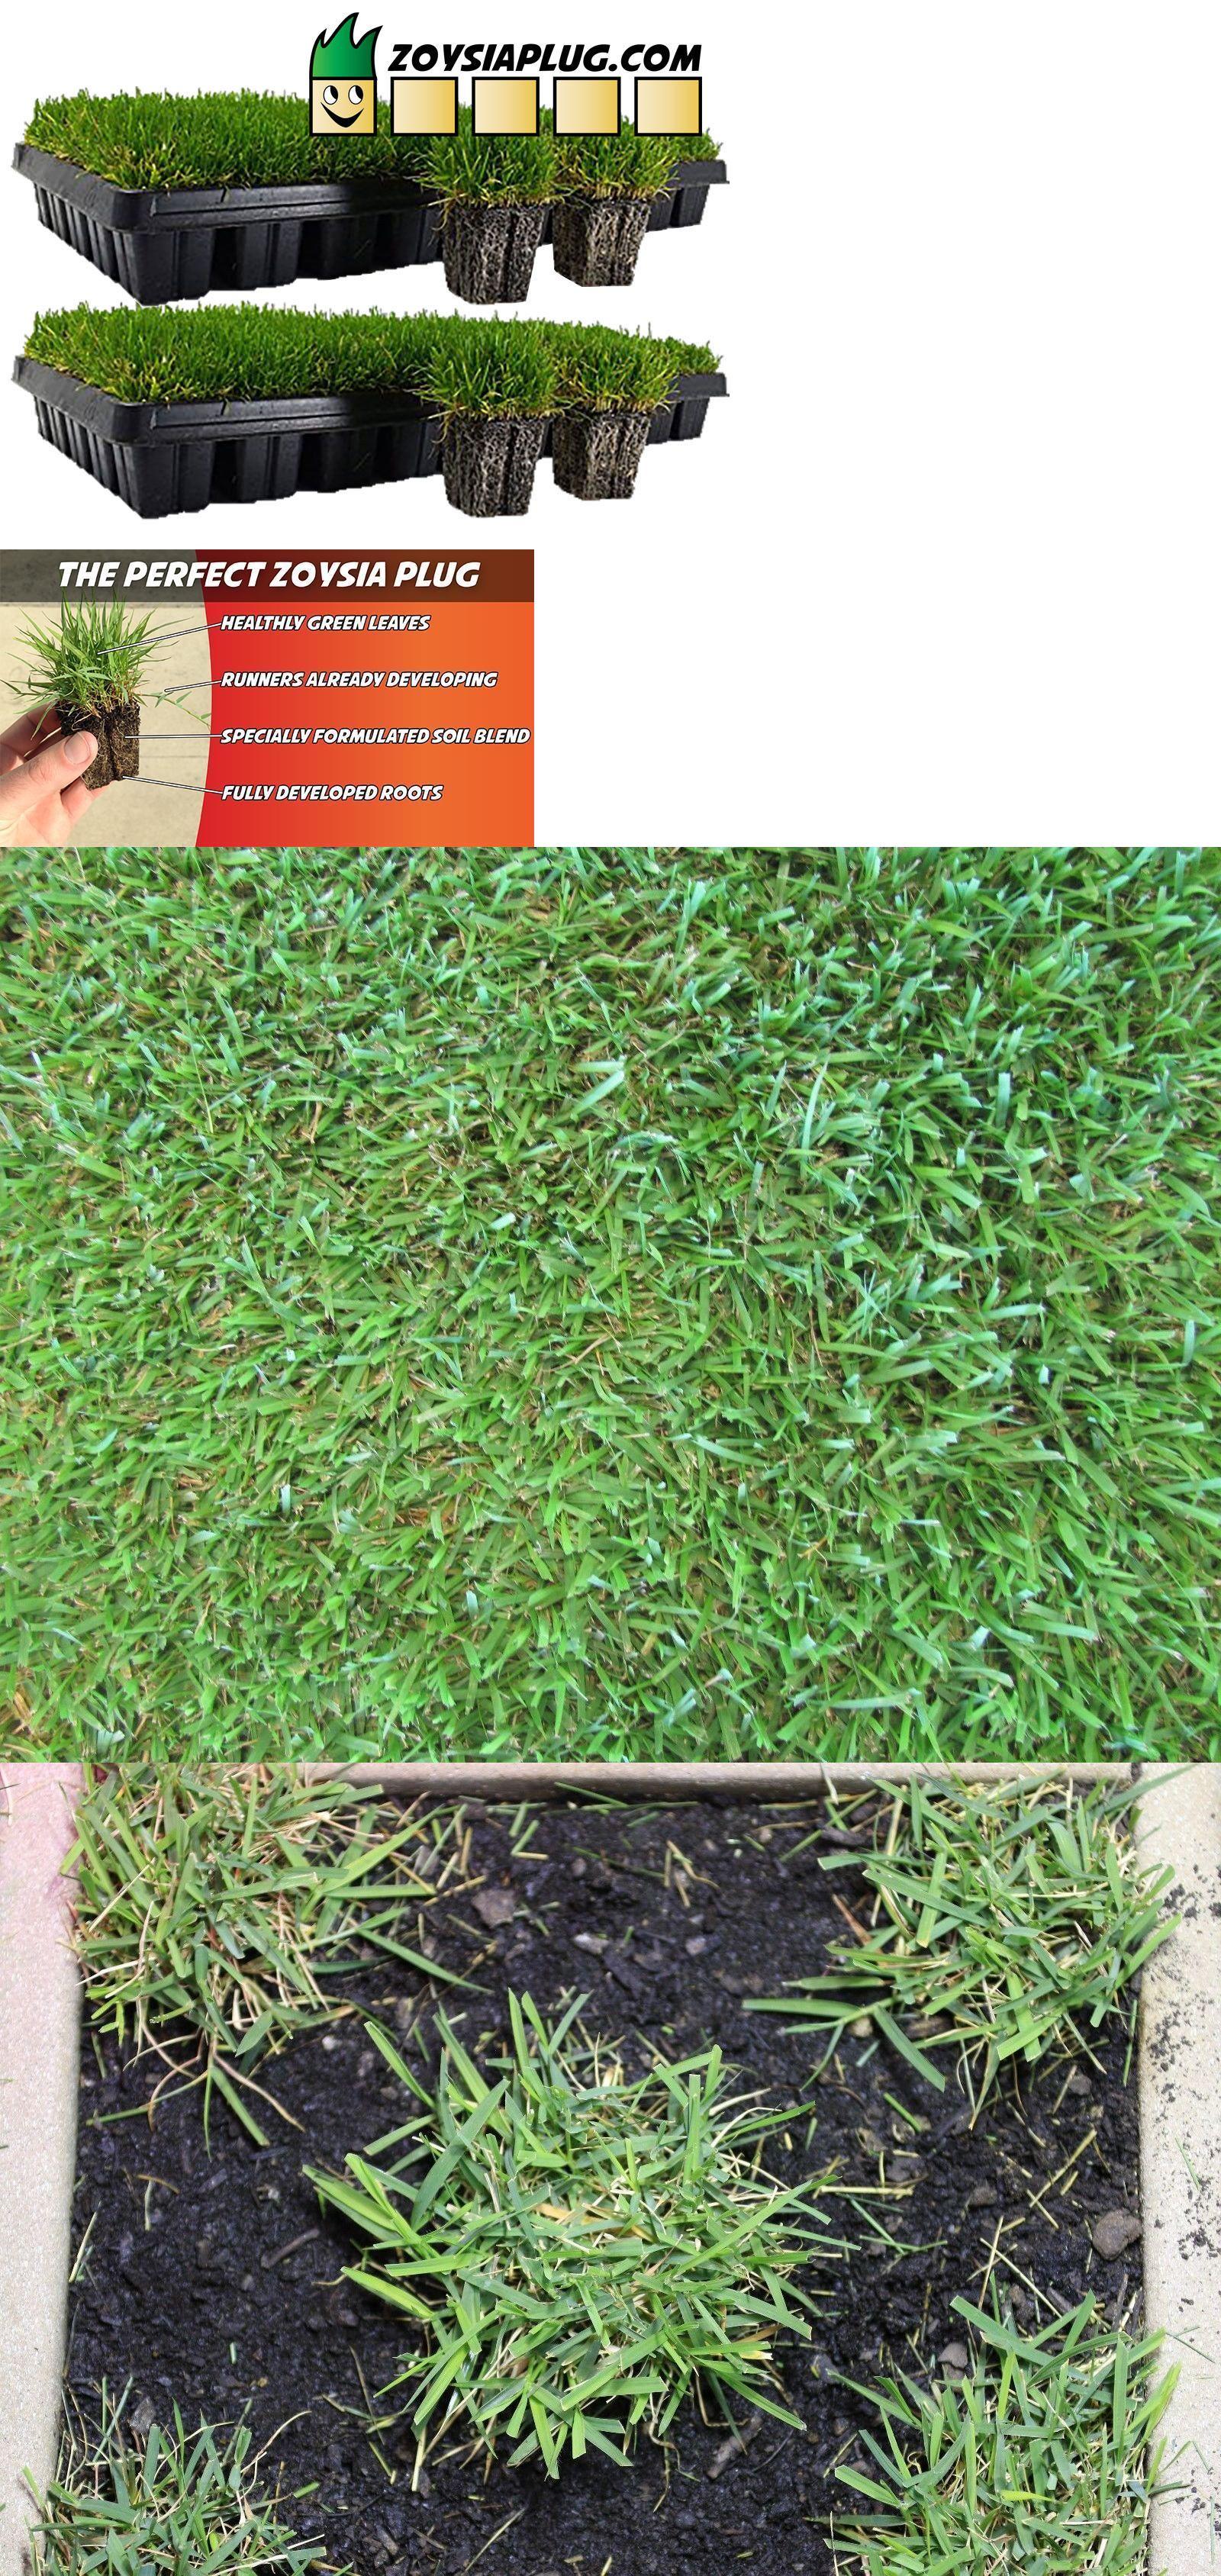 Seed Starting And Cloning 178986 Zoysia Grass Plugs Two Trays 100 Plugs Free Shipping Order Zoysia Lawn Now B Grass Plugs Zoysia Grass Zoysia Grass Plugs